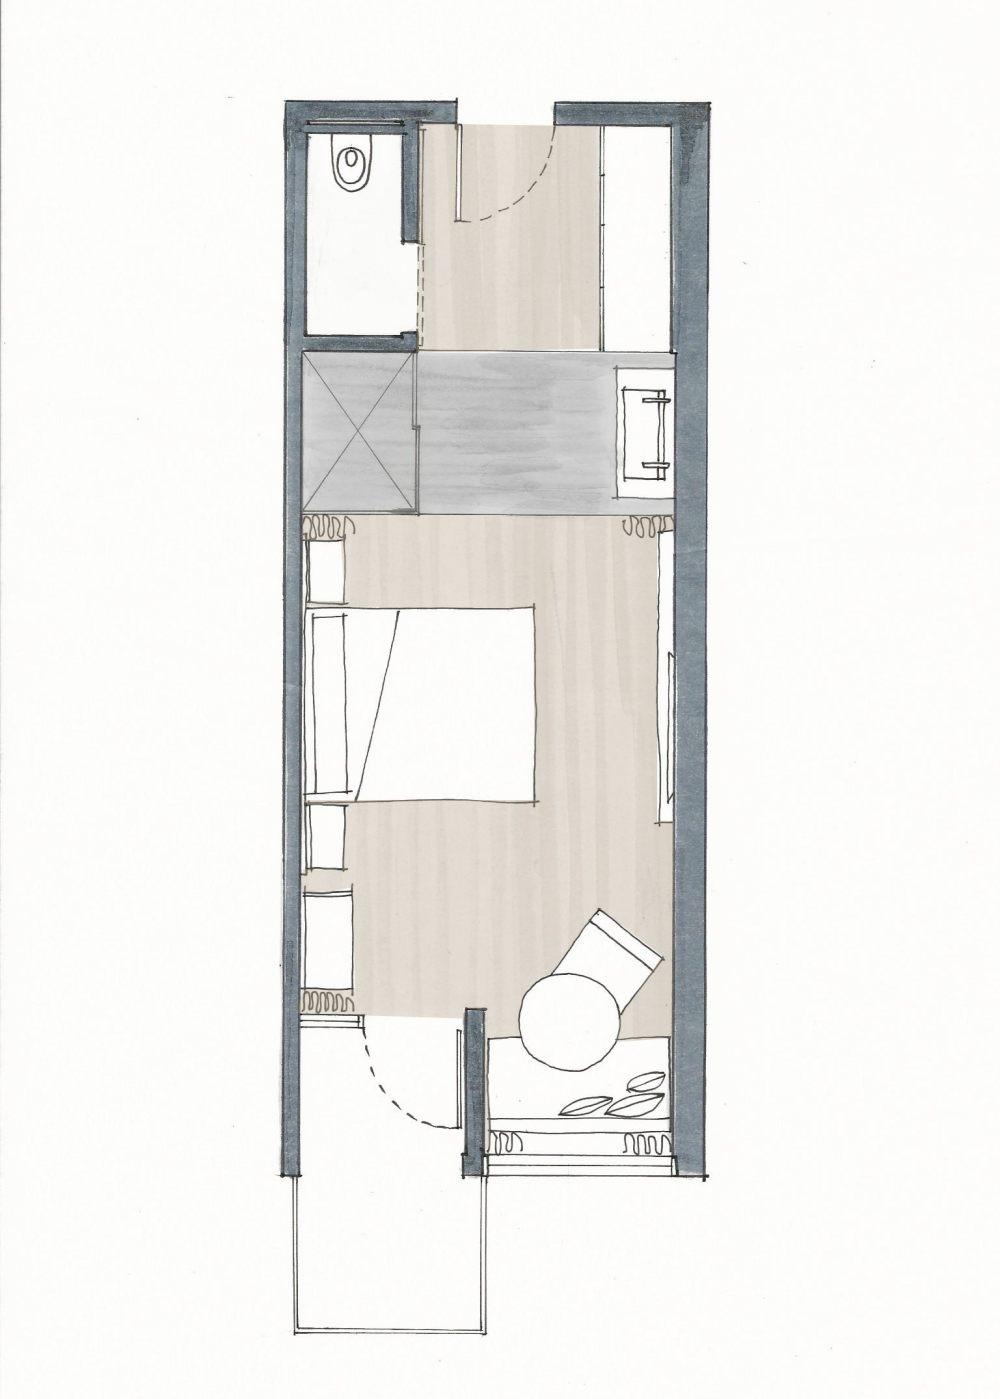 h3guesthouse_©davidbakerarchitects_stndrdrmplan_1_1.jpg